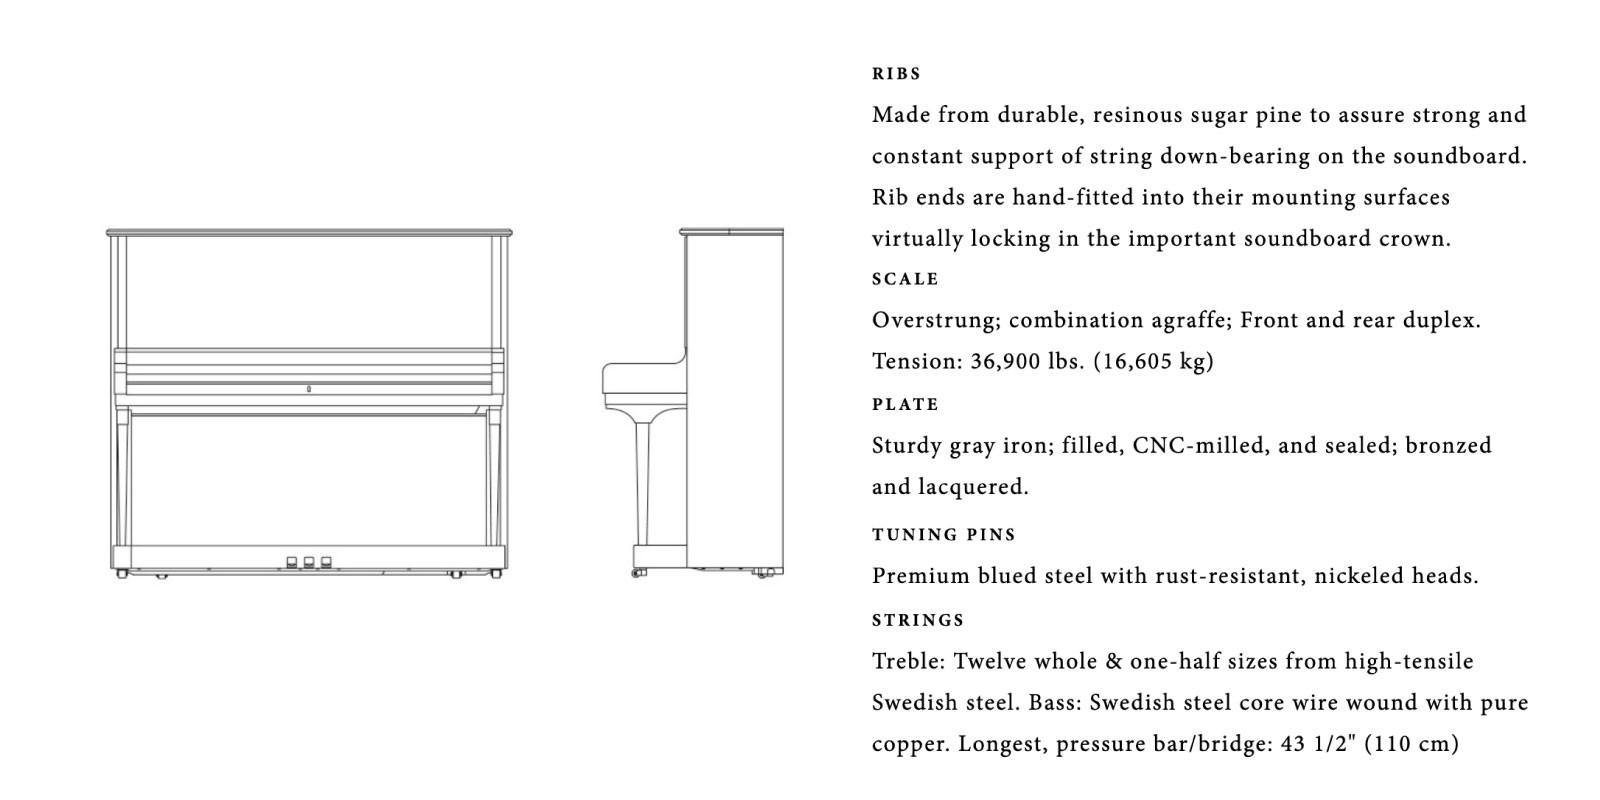 PP-Steinway-MODEL-1098-Details-2.jpg